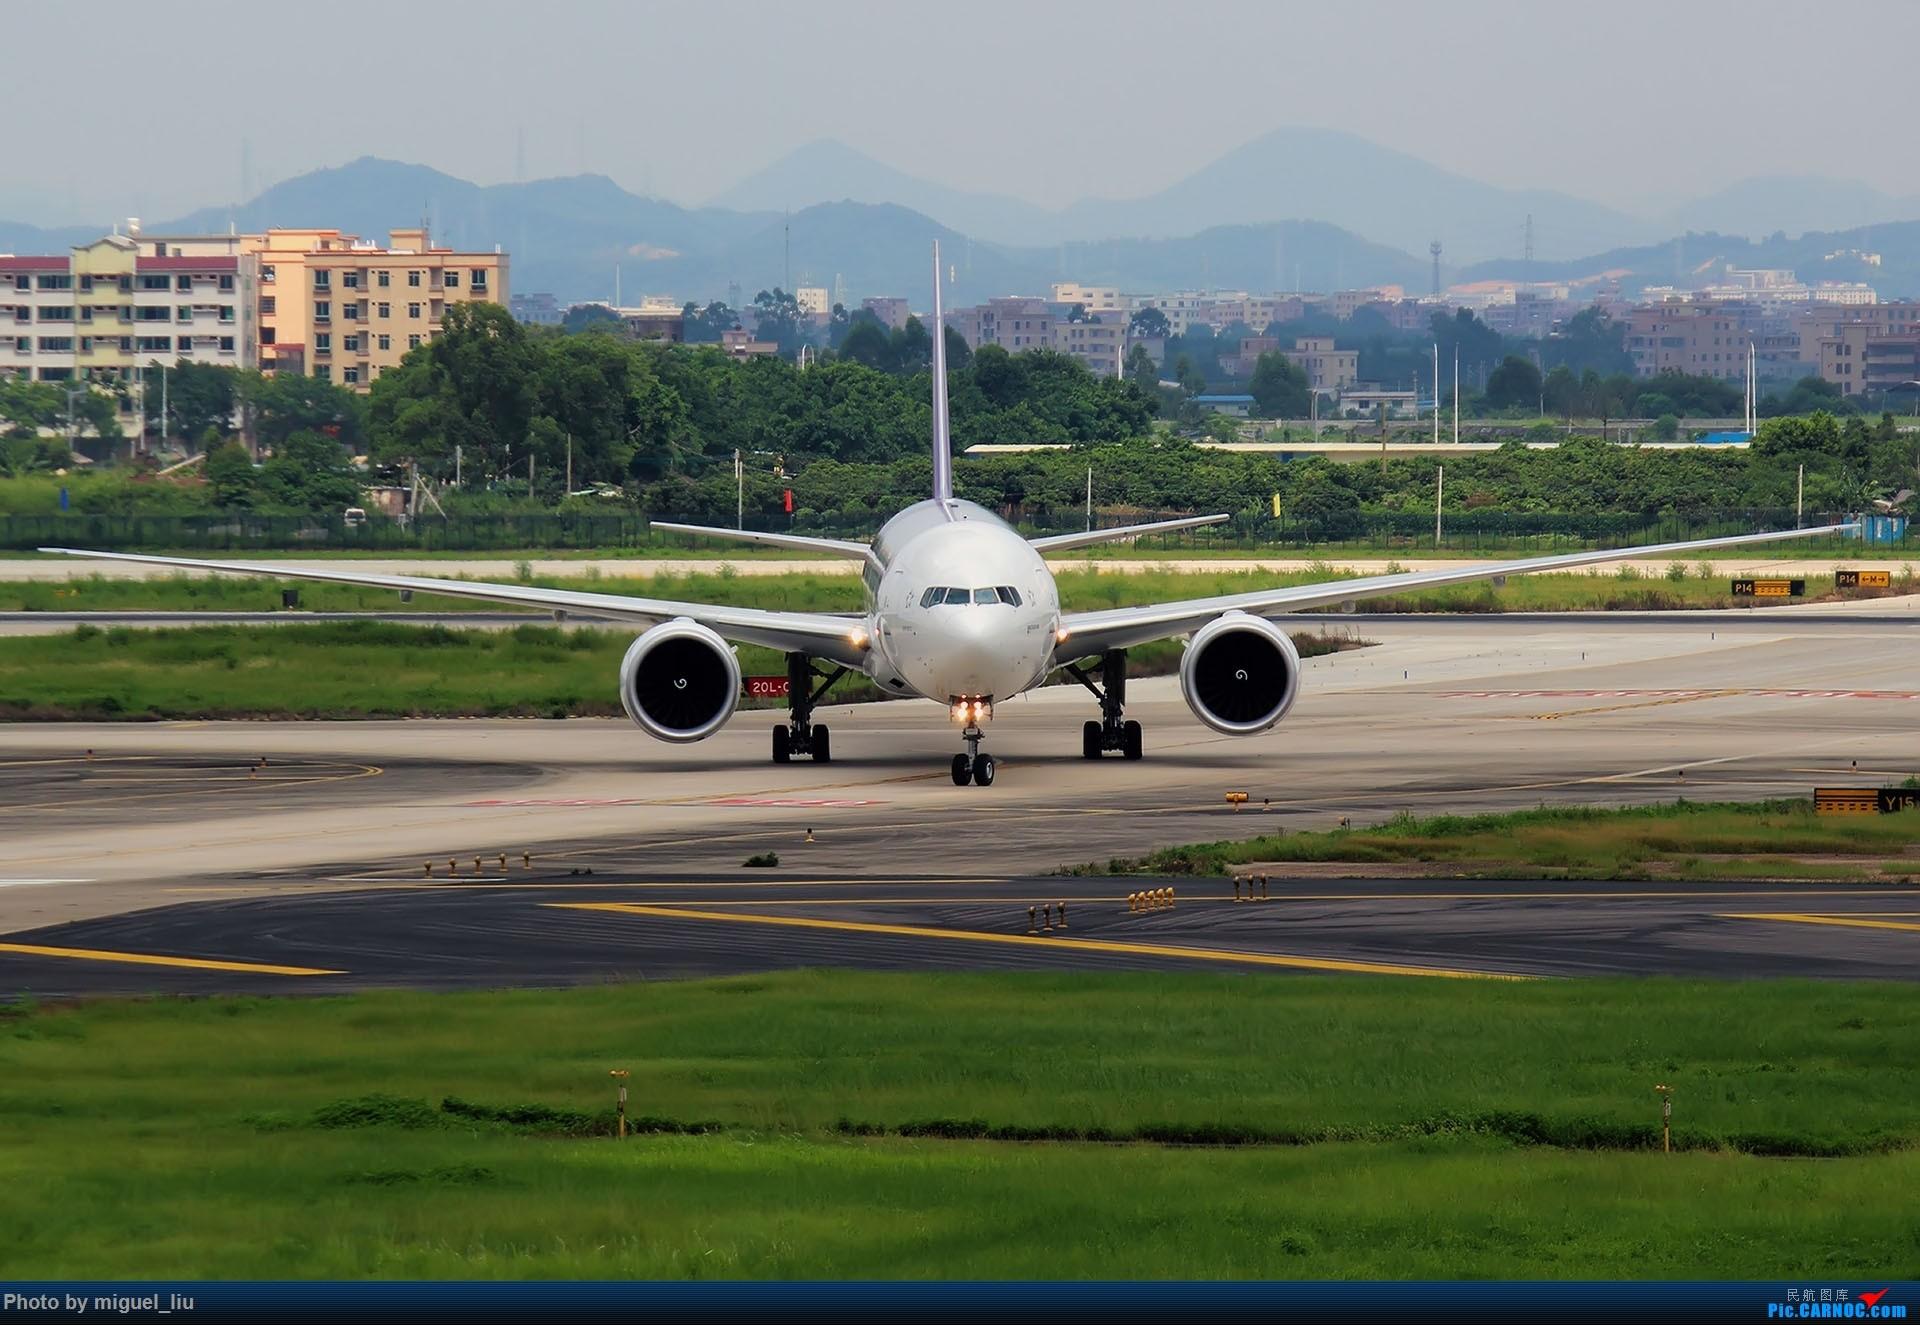 Re:[原创][*********Miguel_liu********]7月28日例行打卡 BOEING 777-300ER HS-TKW 中国广州白云国际机场